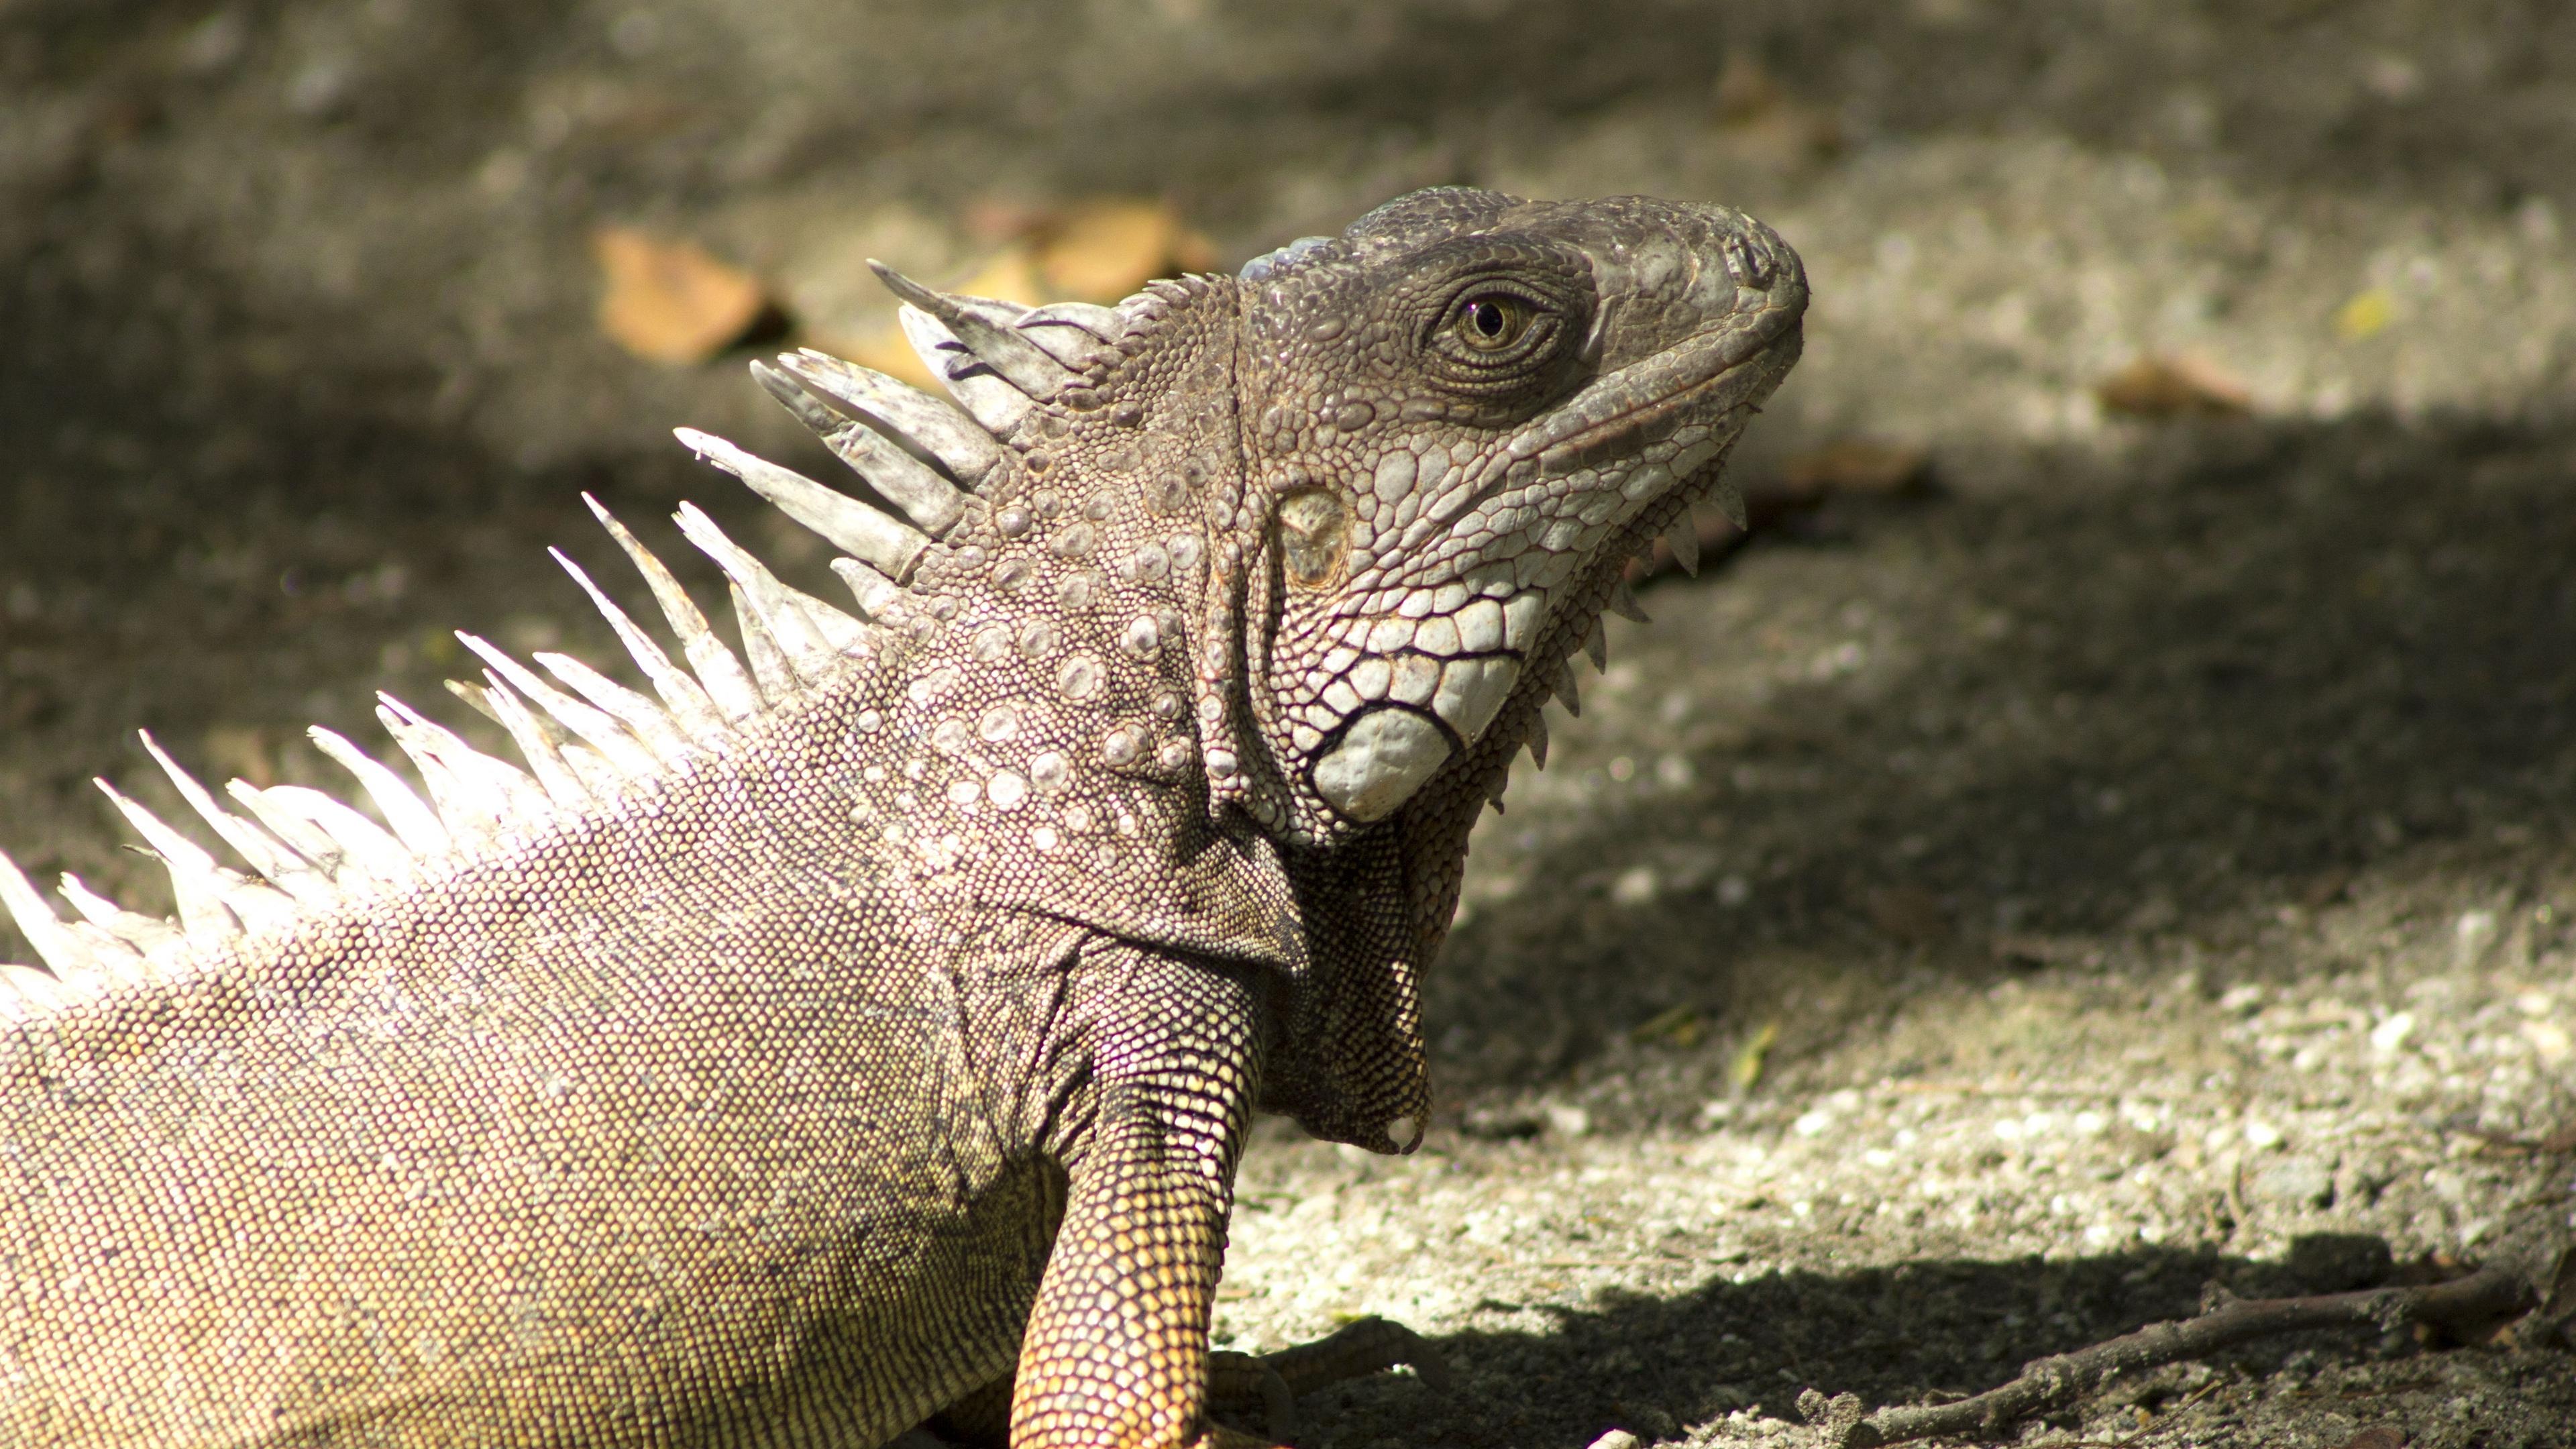 iguana reptile shadow 4k 1542242968 - iguana, reptile, shadow 4k - Shadow, reptile, iguana